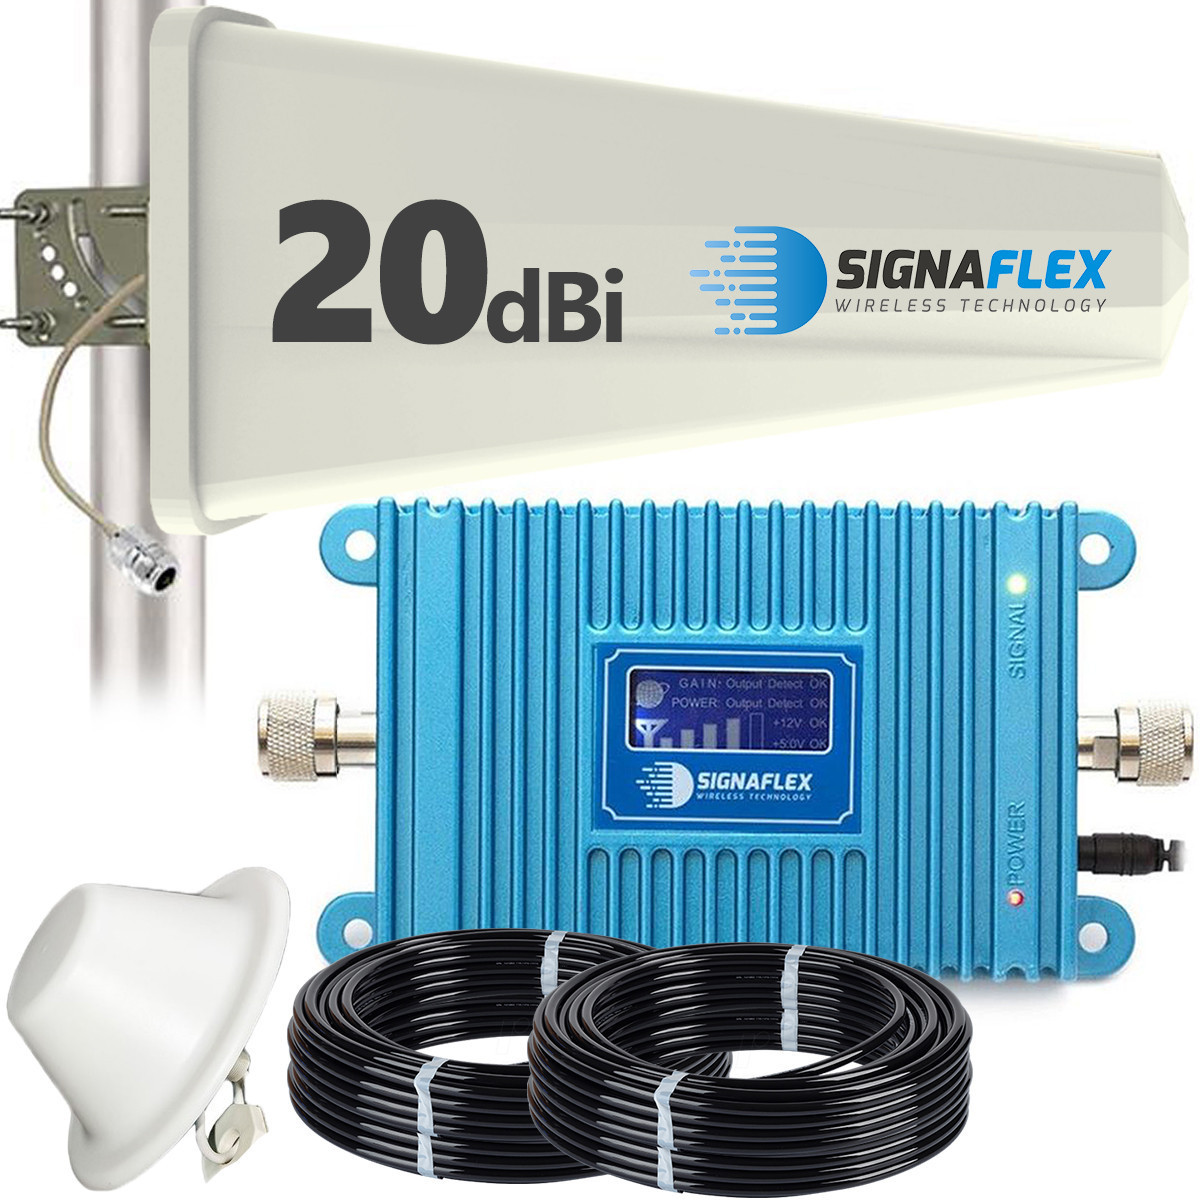 Komplet GSM Blue LCD600 Tajfun z grzybkiem